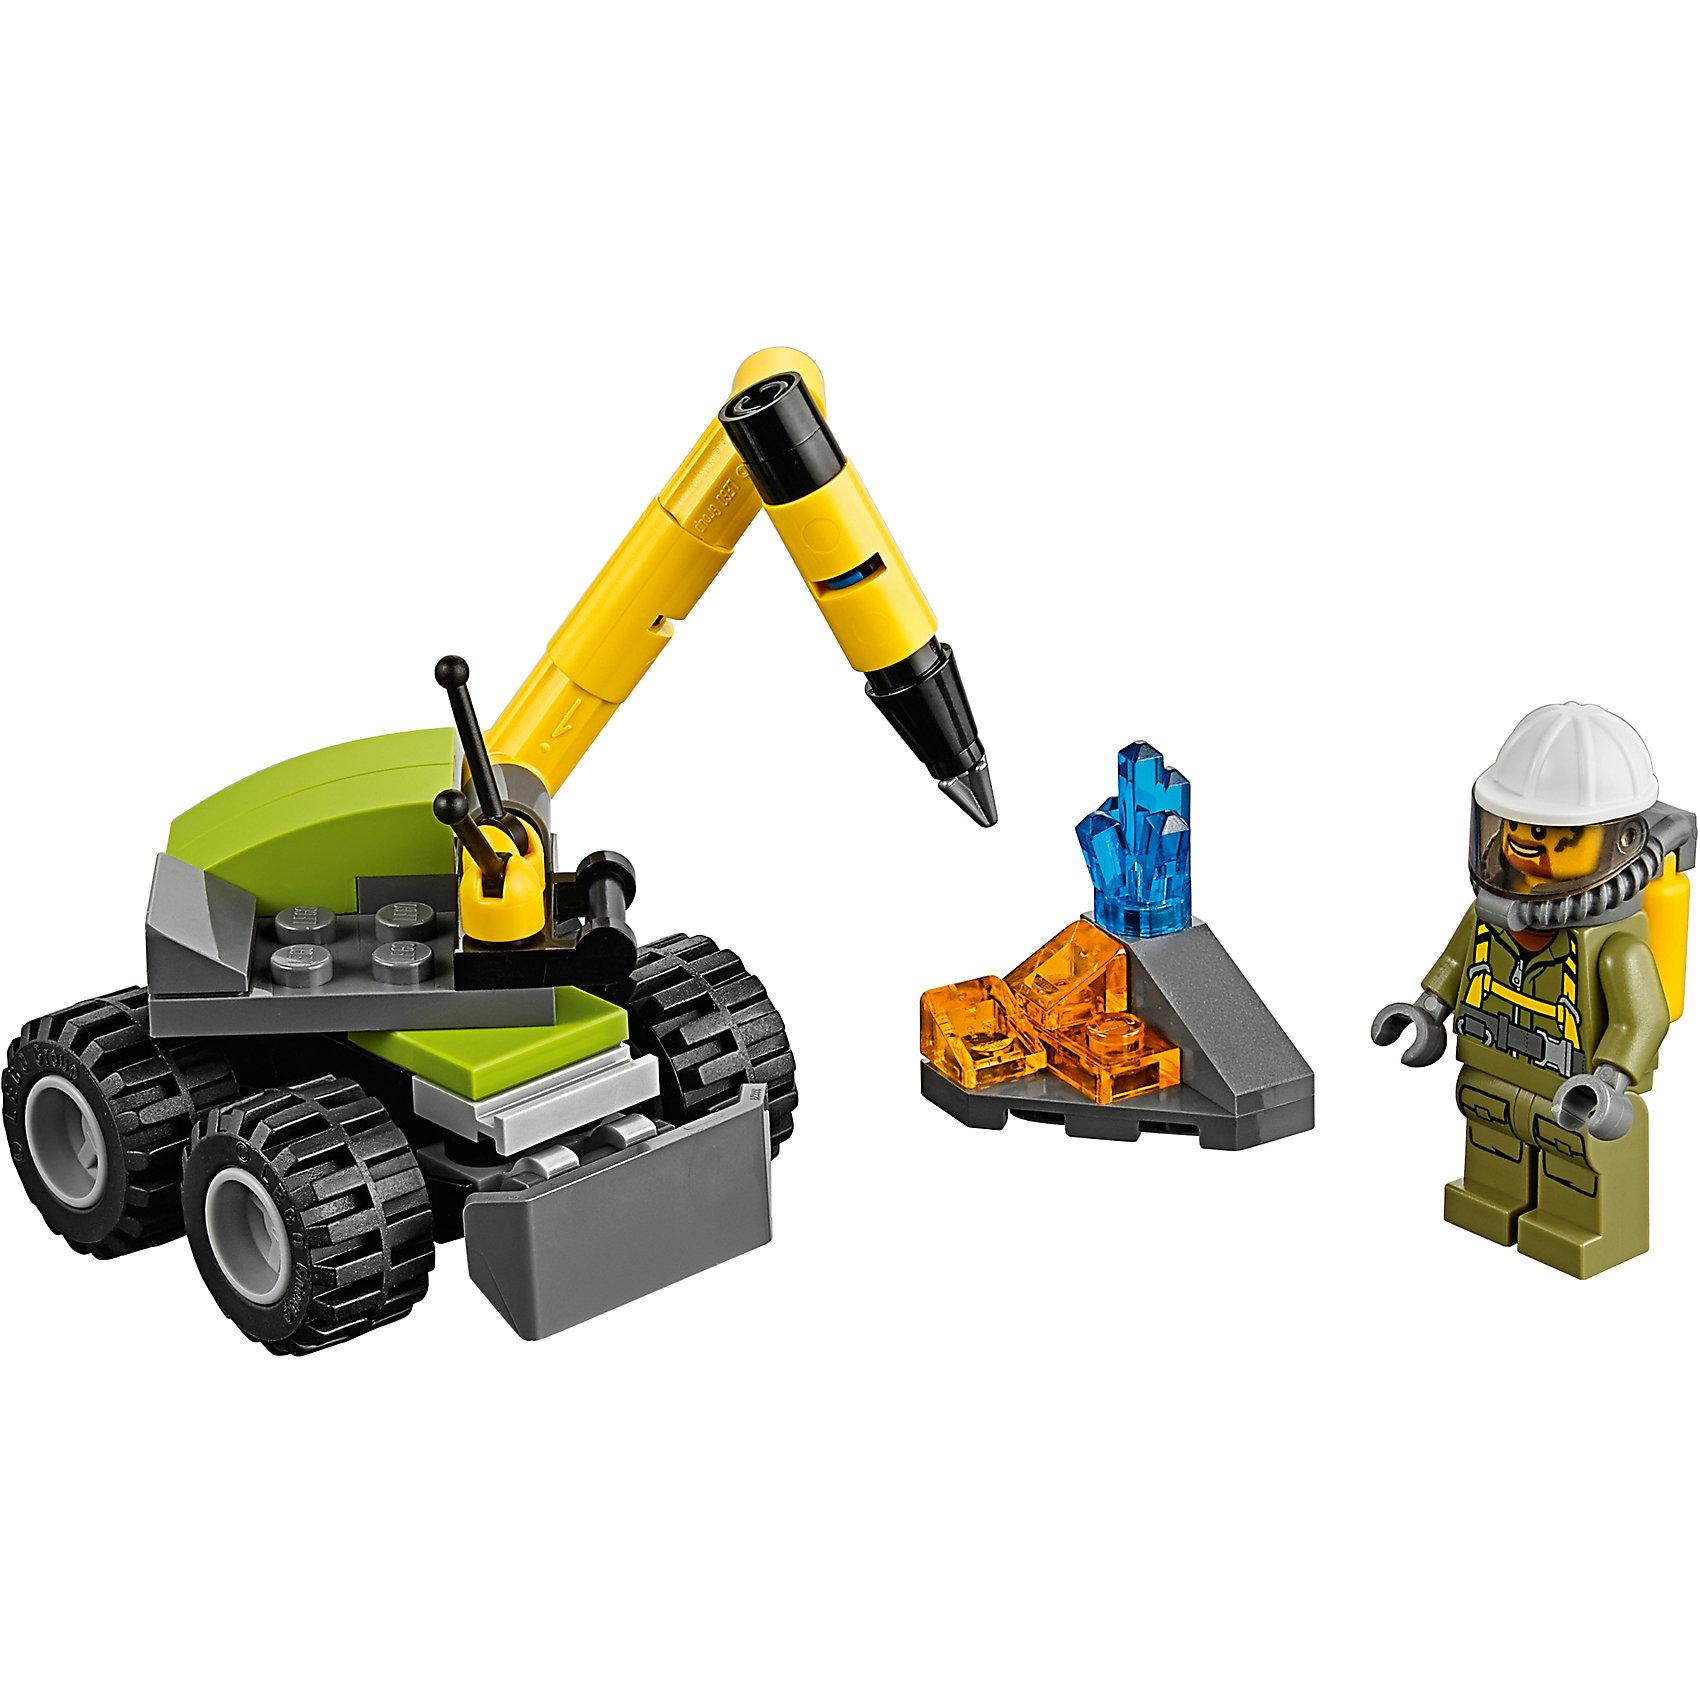 LEGO City 30350: мини-набор ВулканLEGO<br><br><br>Ширина мм: 150<br>Глубина мм: 30<br>Высота мм: 150<br>Вес г: 60<br>Возраст от месяцев: 60<br>Возраст до месяцев: 144<br>Пол: Мужской<br>Возраст: Детский<br>SKU: 4918809